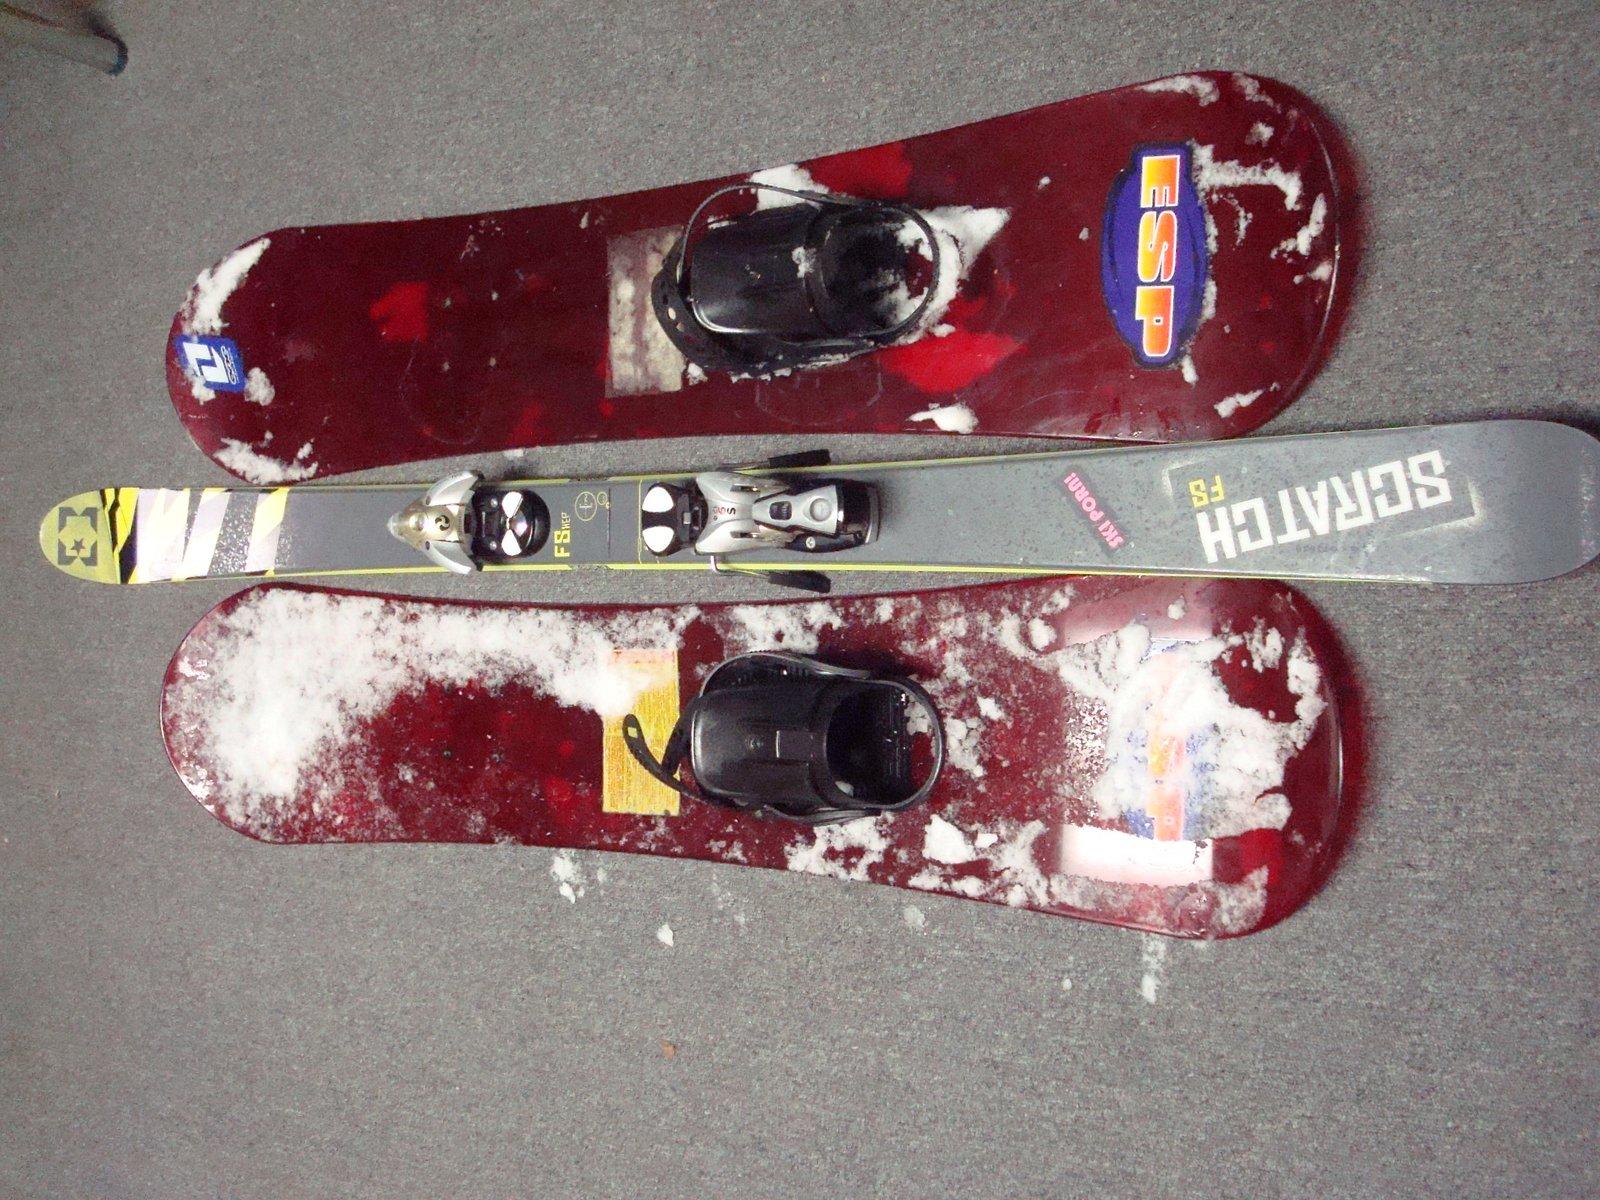 New pow skis, haha